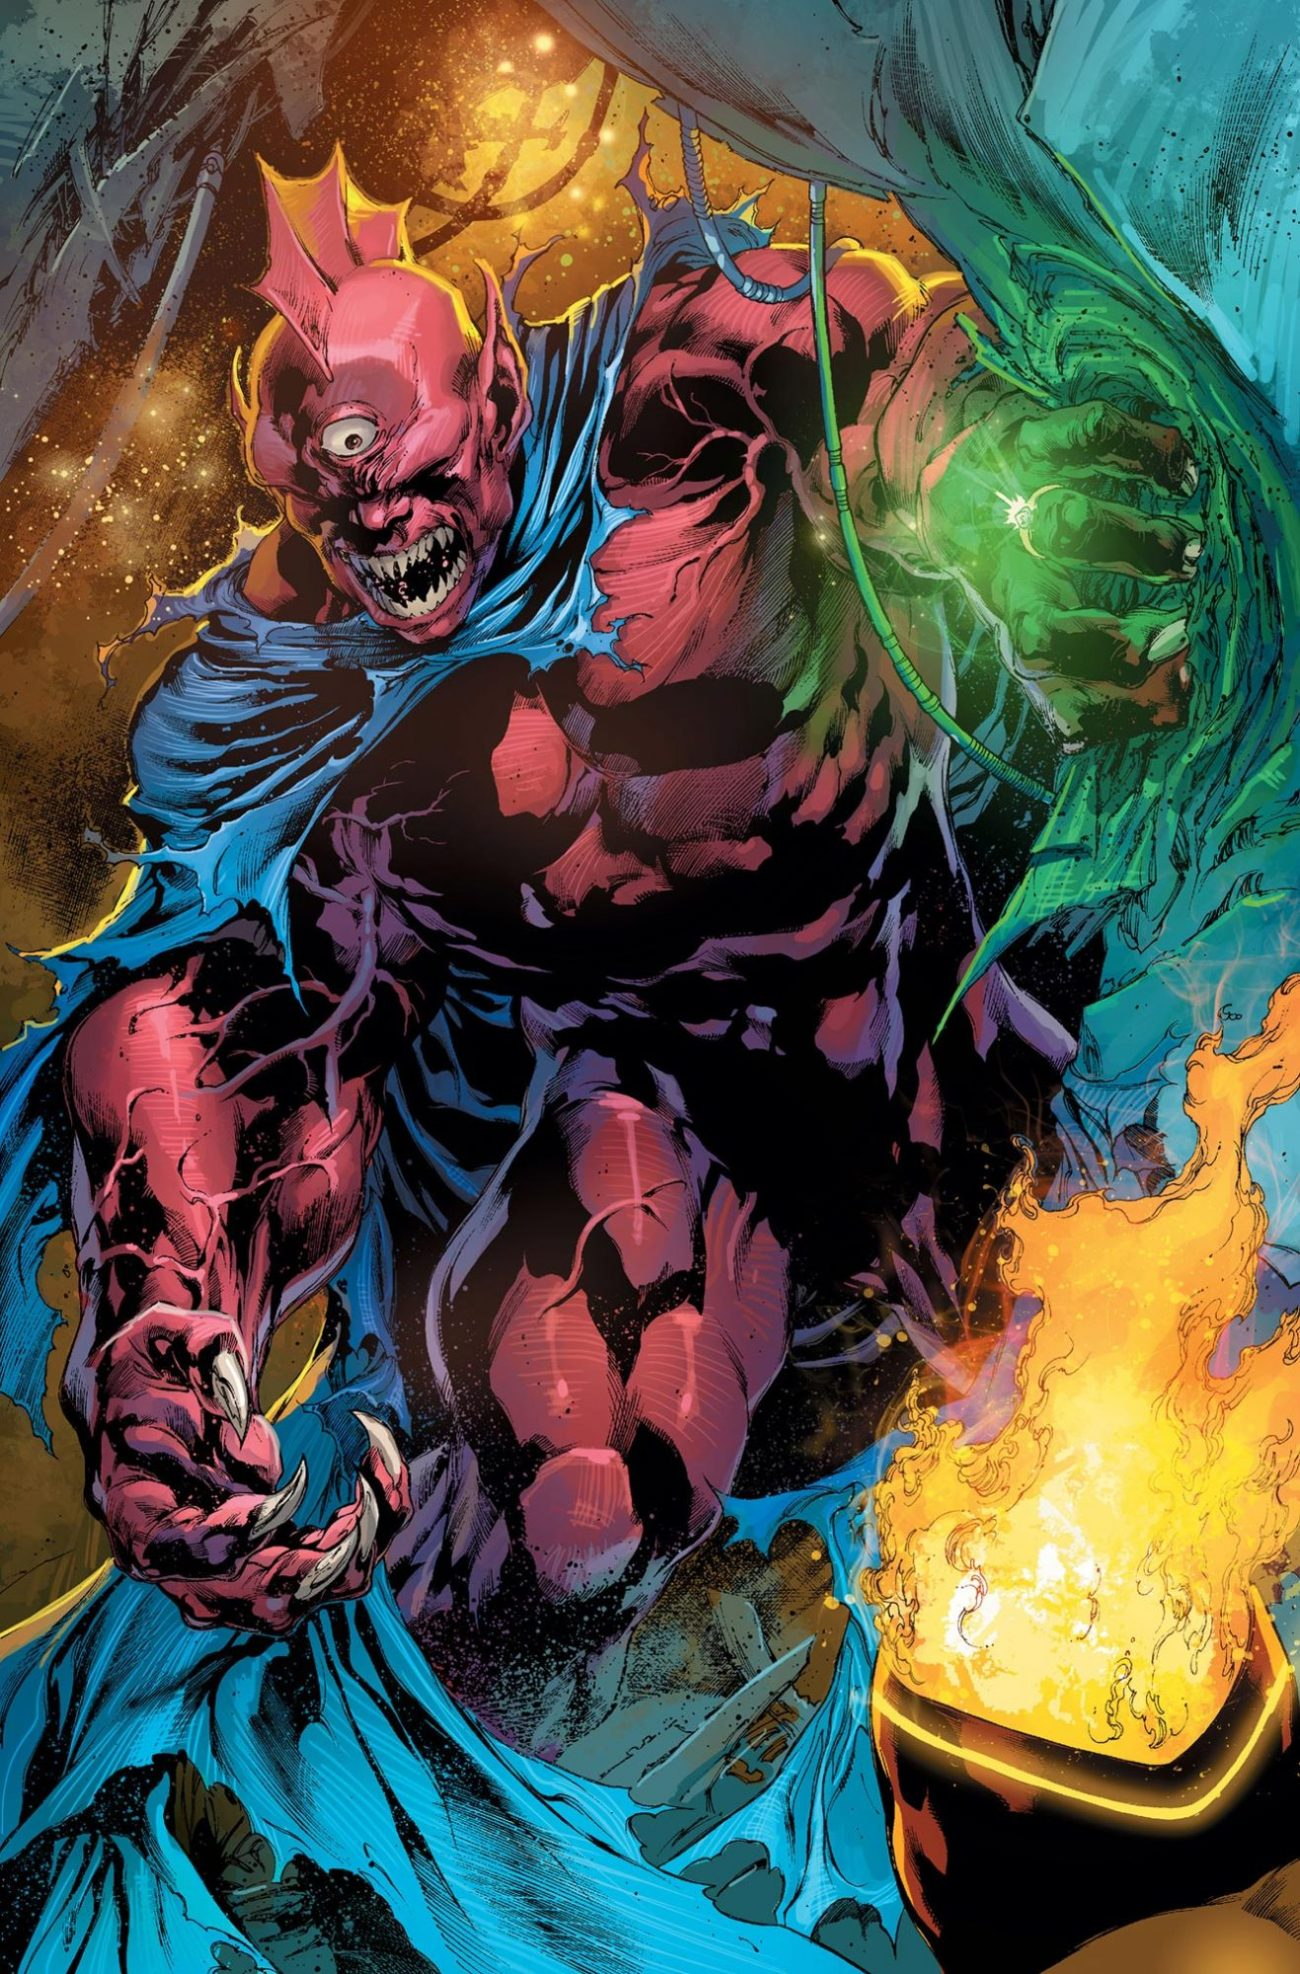 Despero en las páginas de DC Comics. Imagen: DC Comics